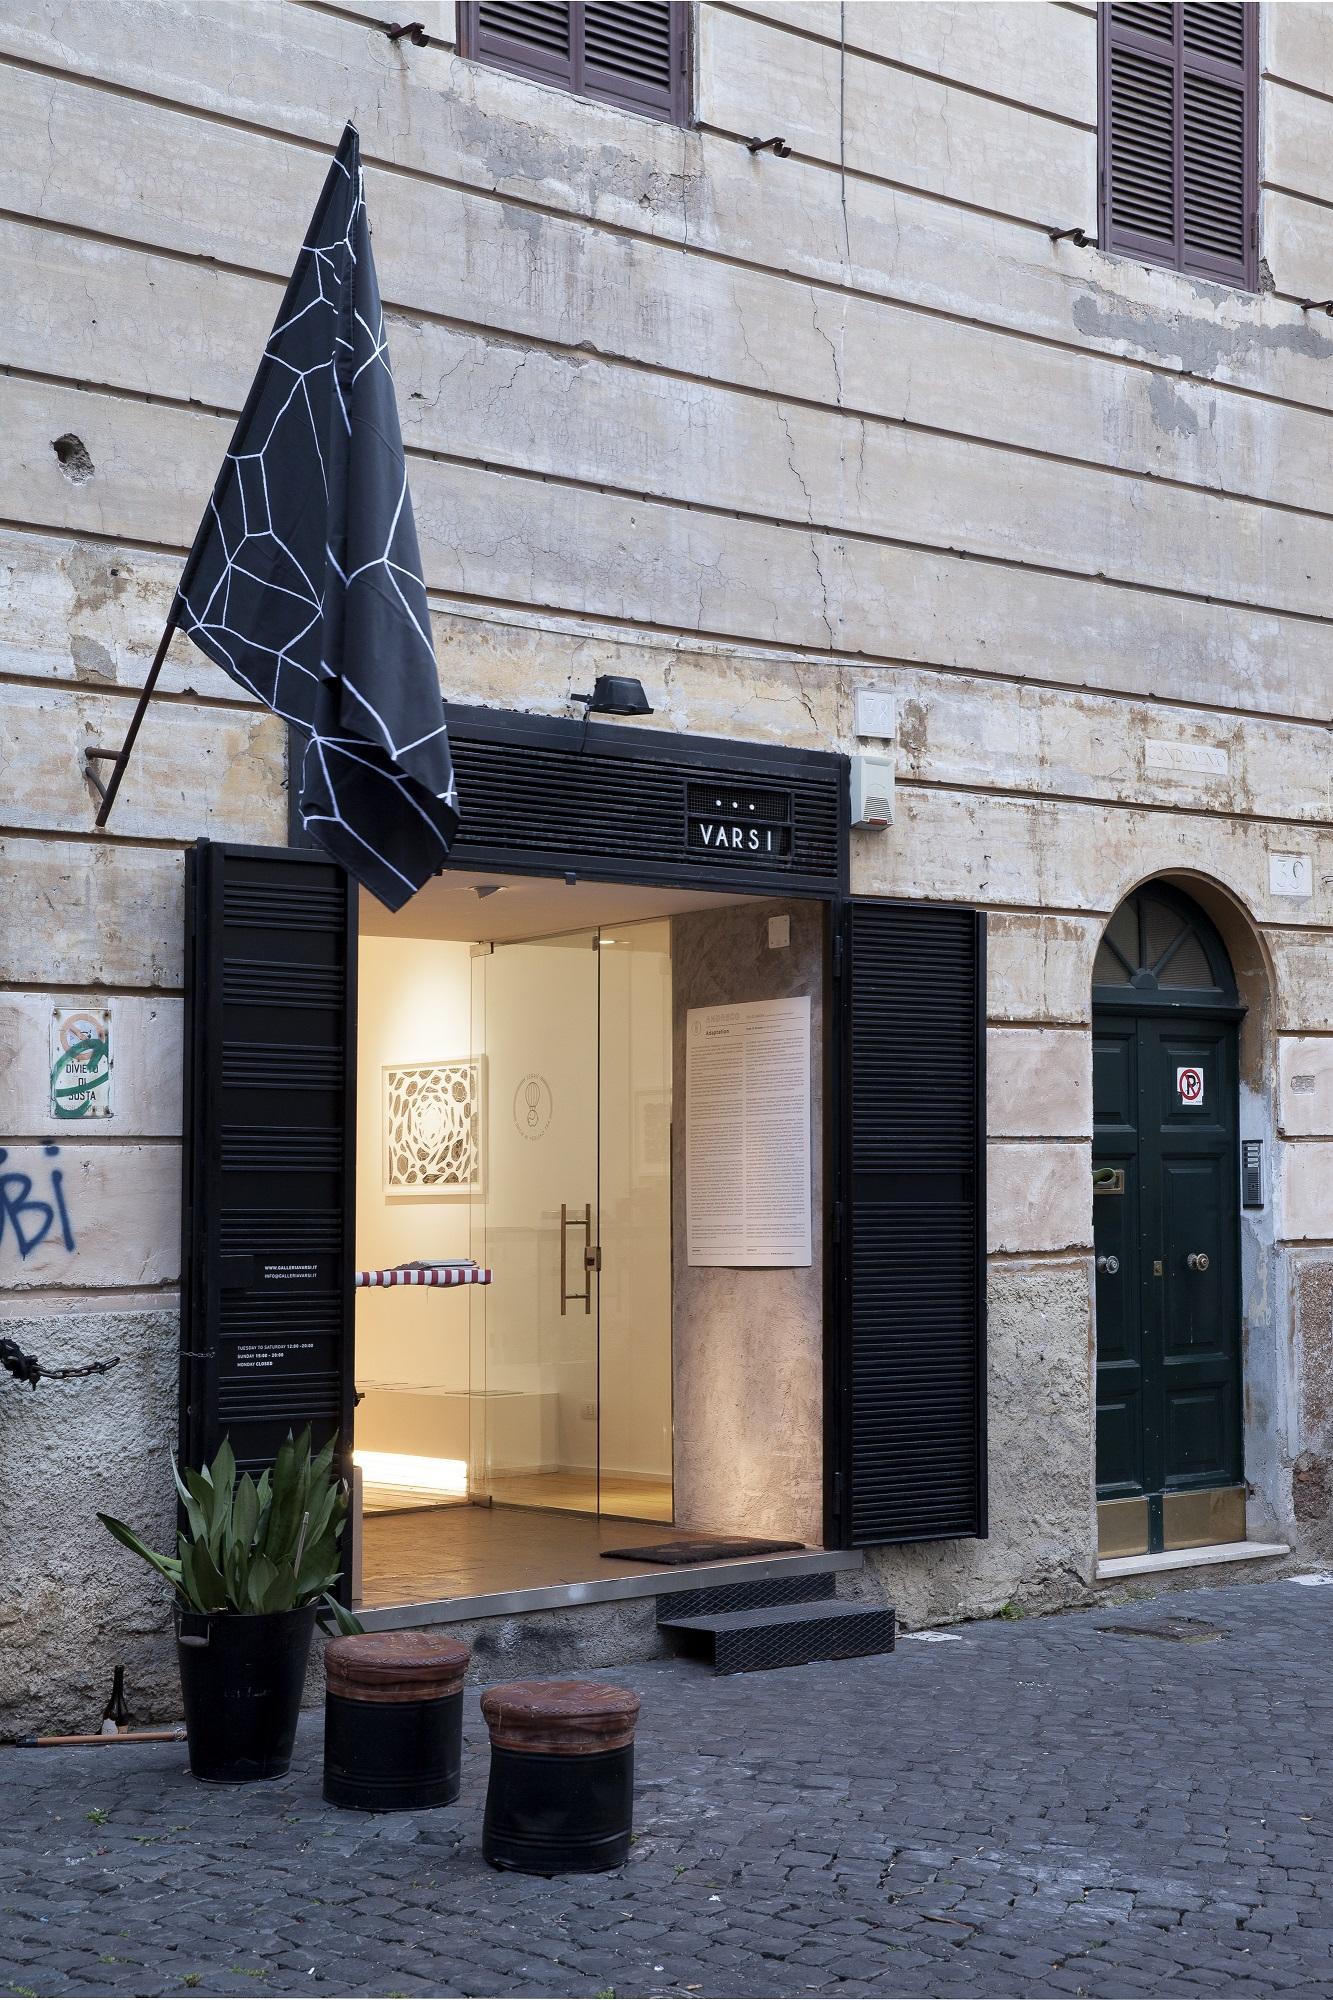 Adaptation Andreco Galleria Varsi